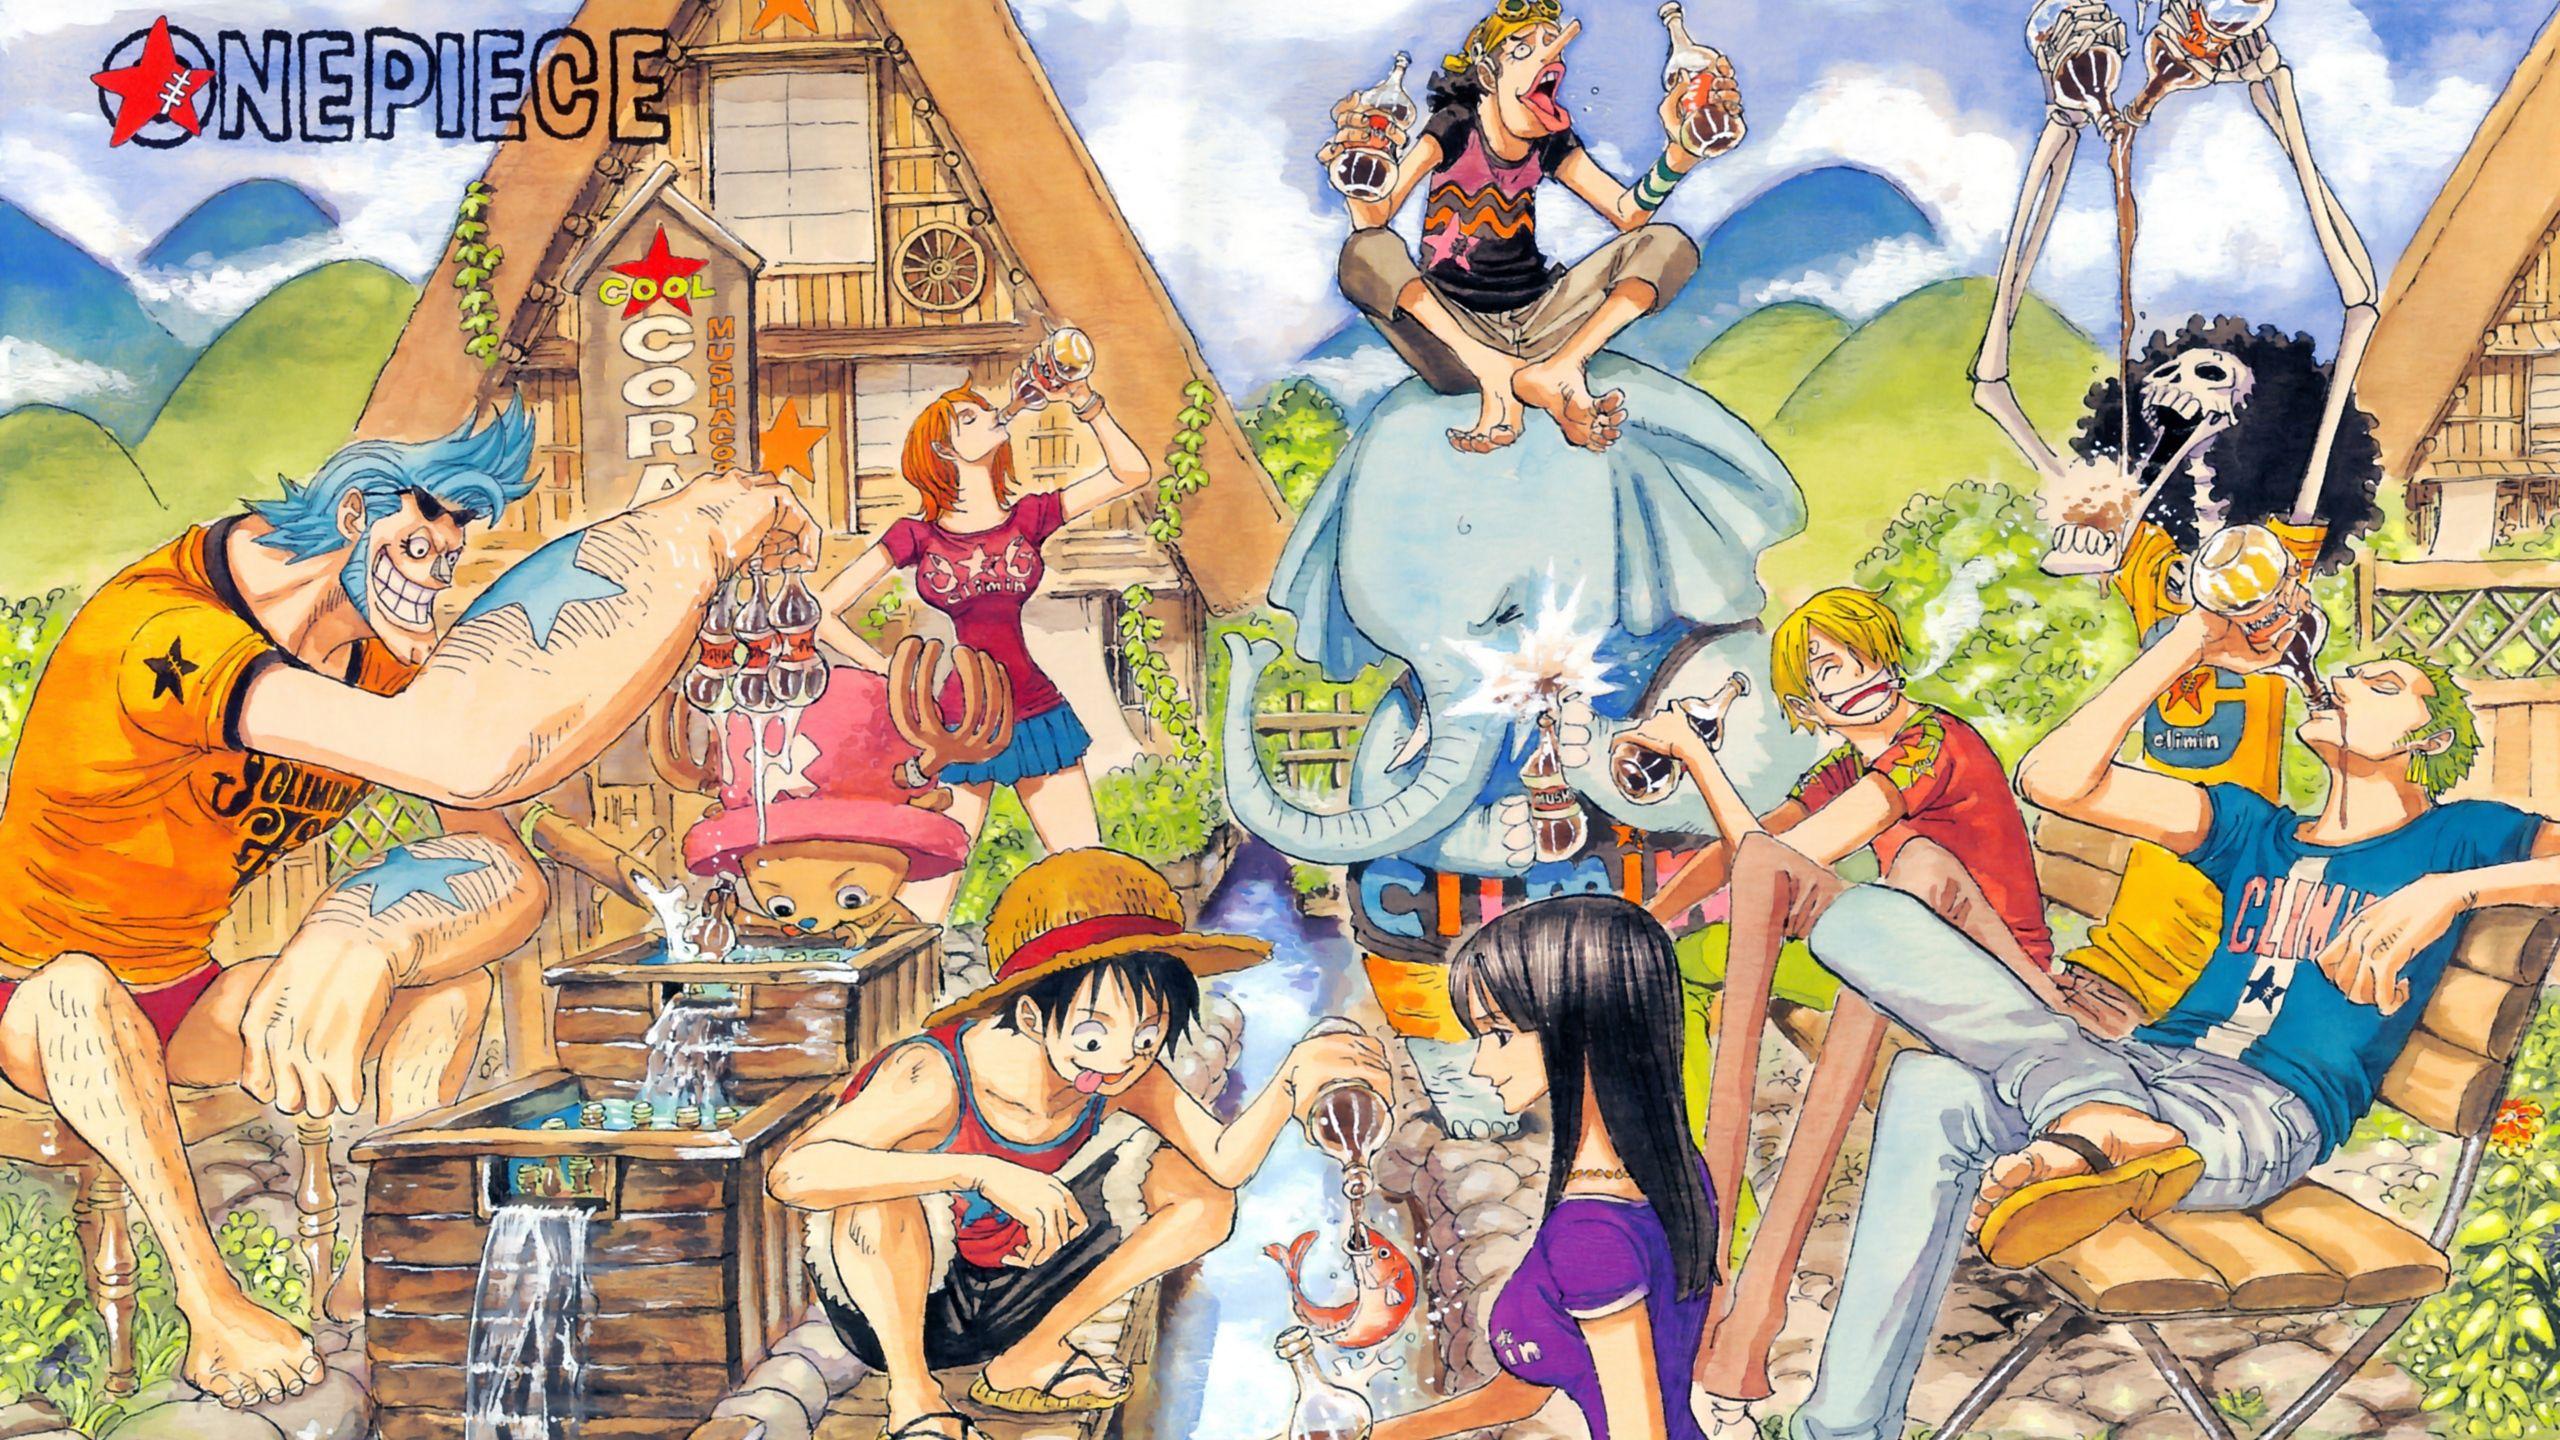 One Piece 566 Wallpaper 1081428 ワンピース 扉絵 ファイター